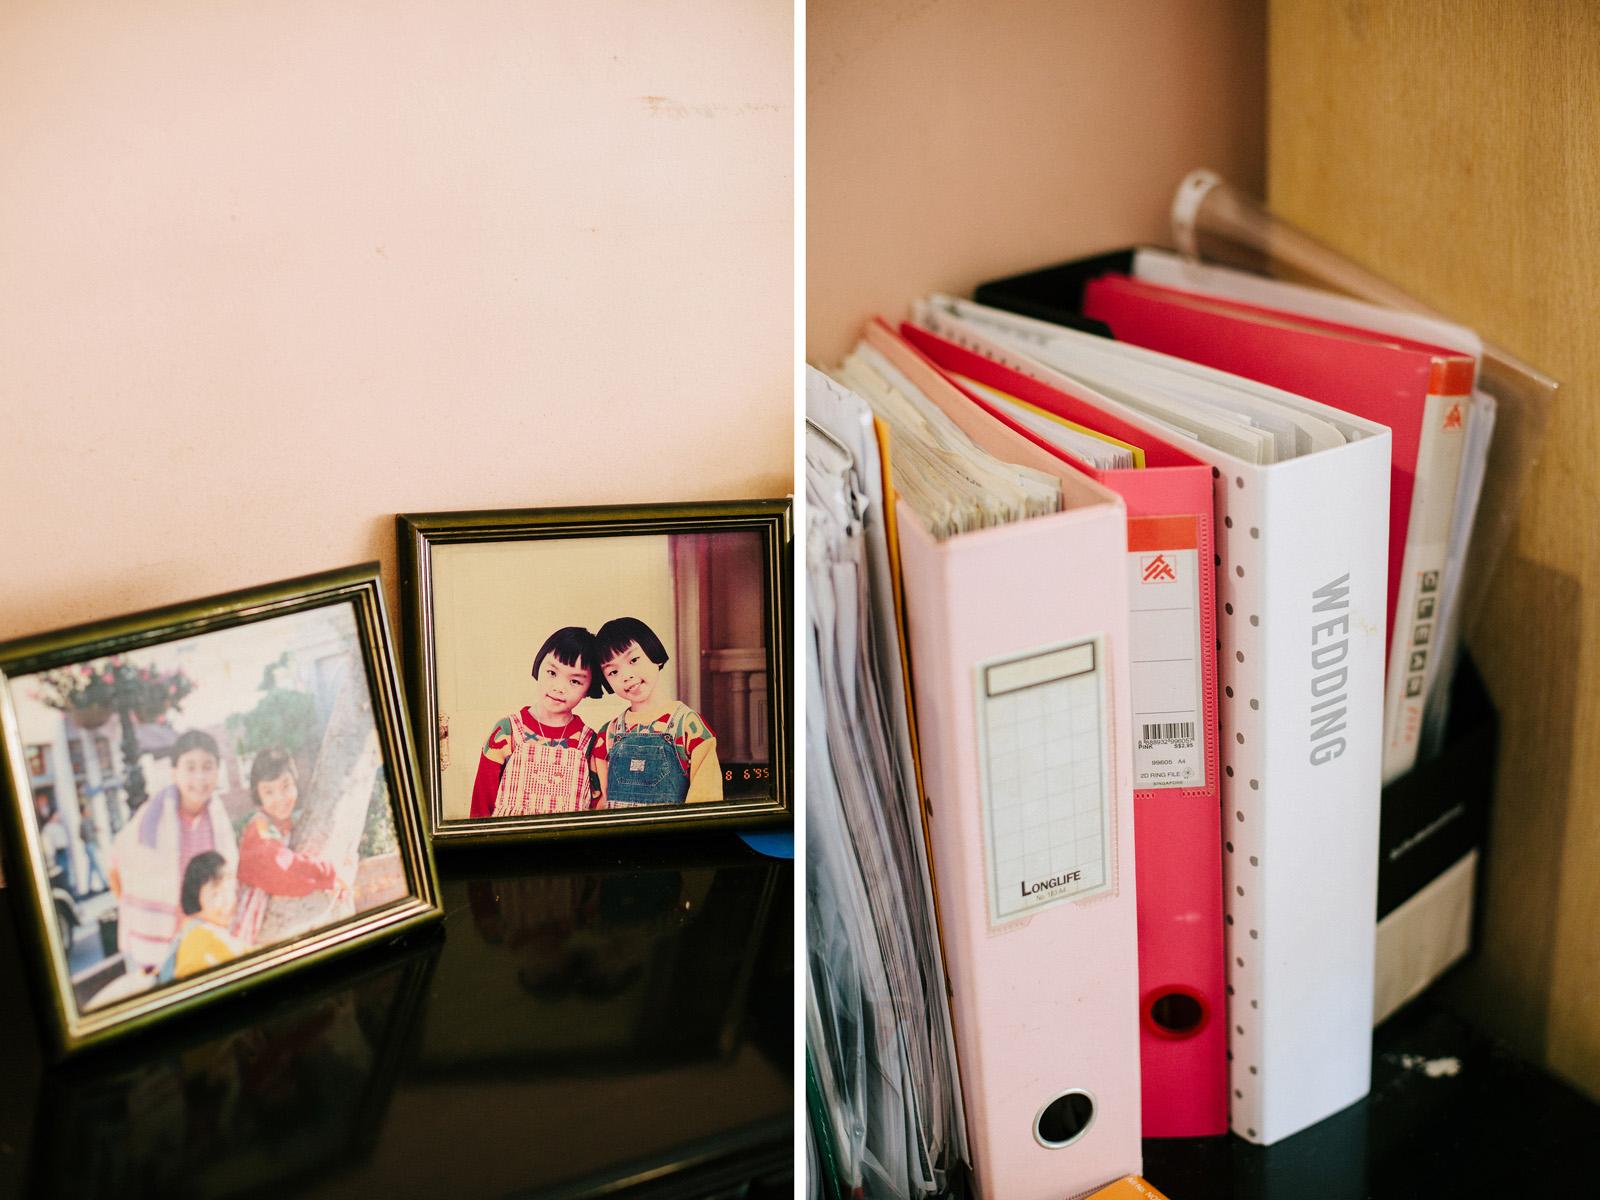 singapore-wedding-travel-photographer-faith-alvin-wedding-wmt-02.jpg